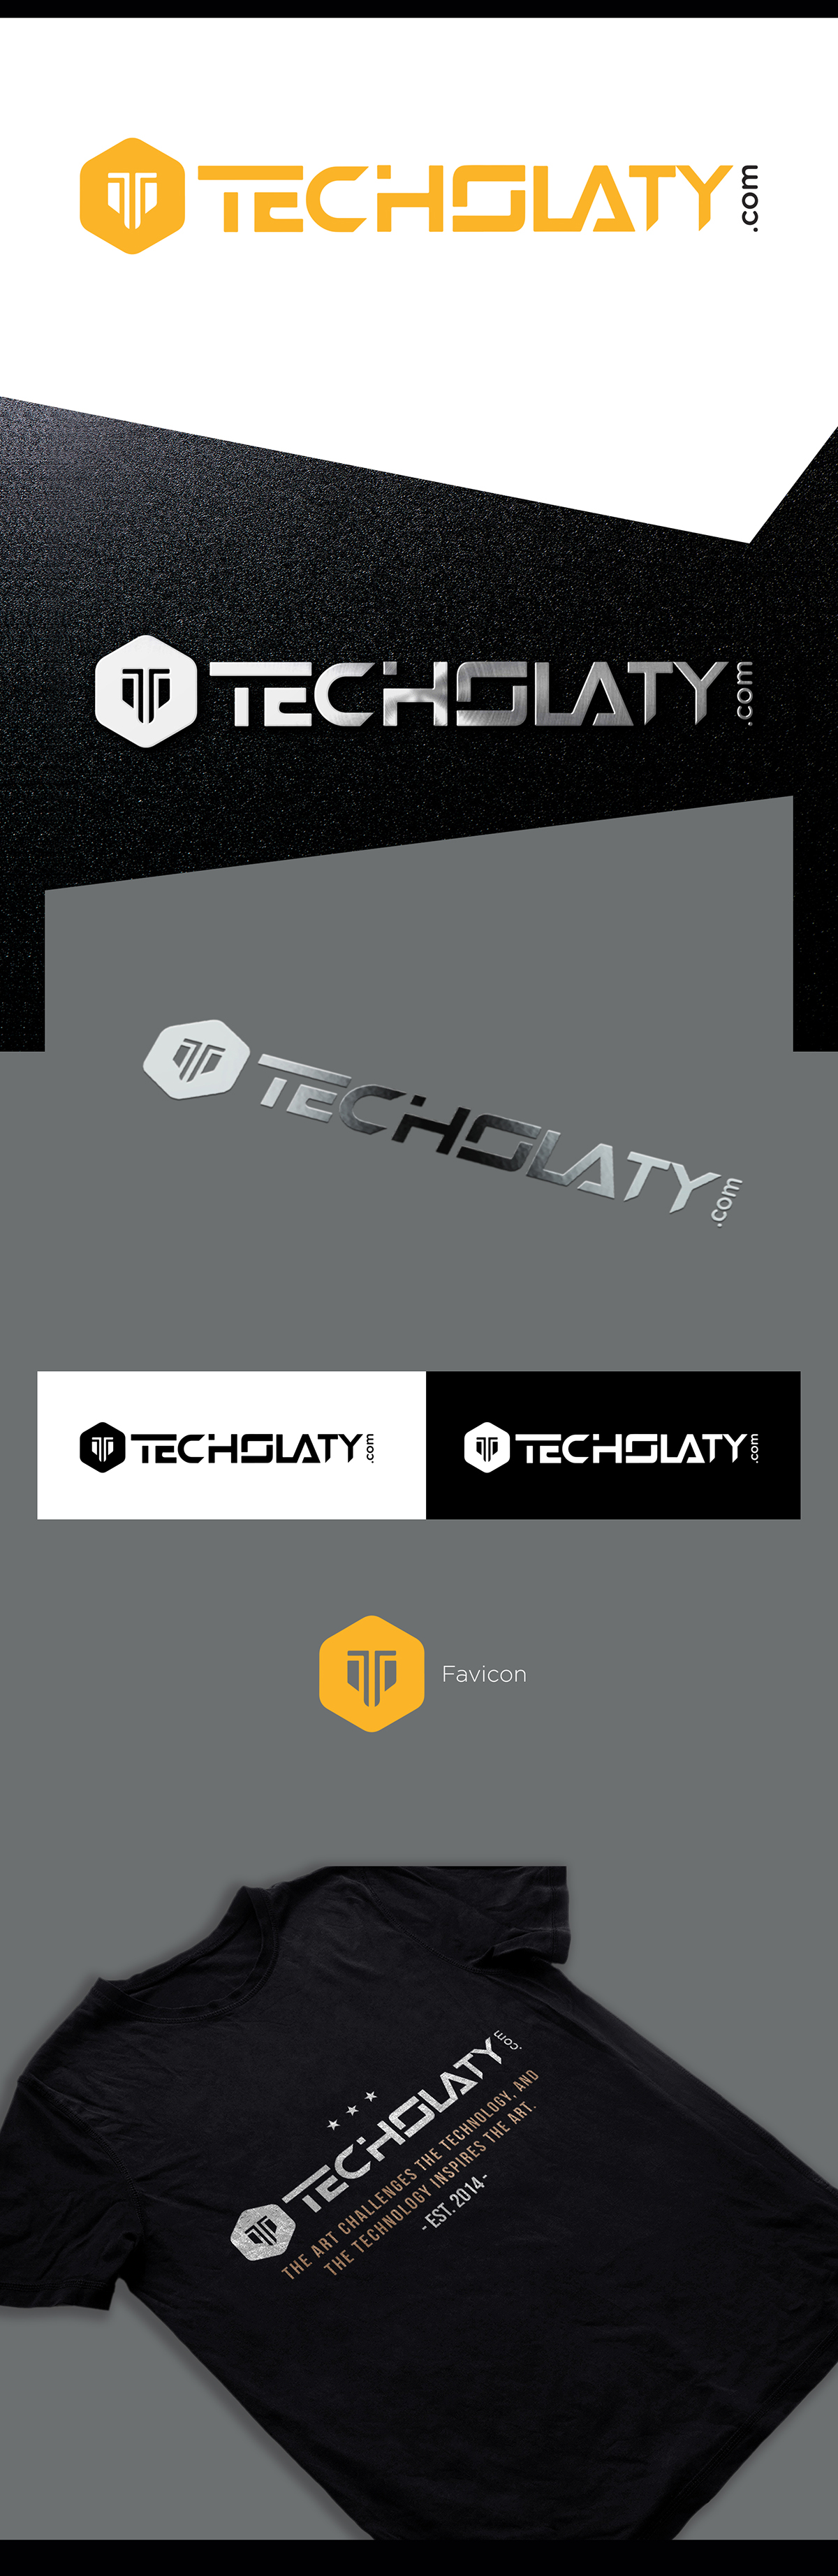 logo Technology Website Transformers Yellow logo Blog